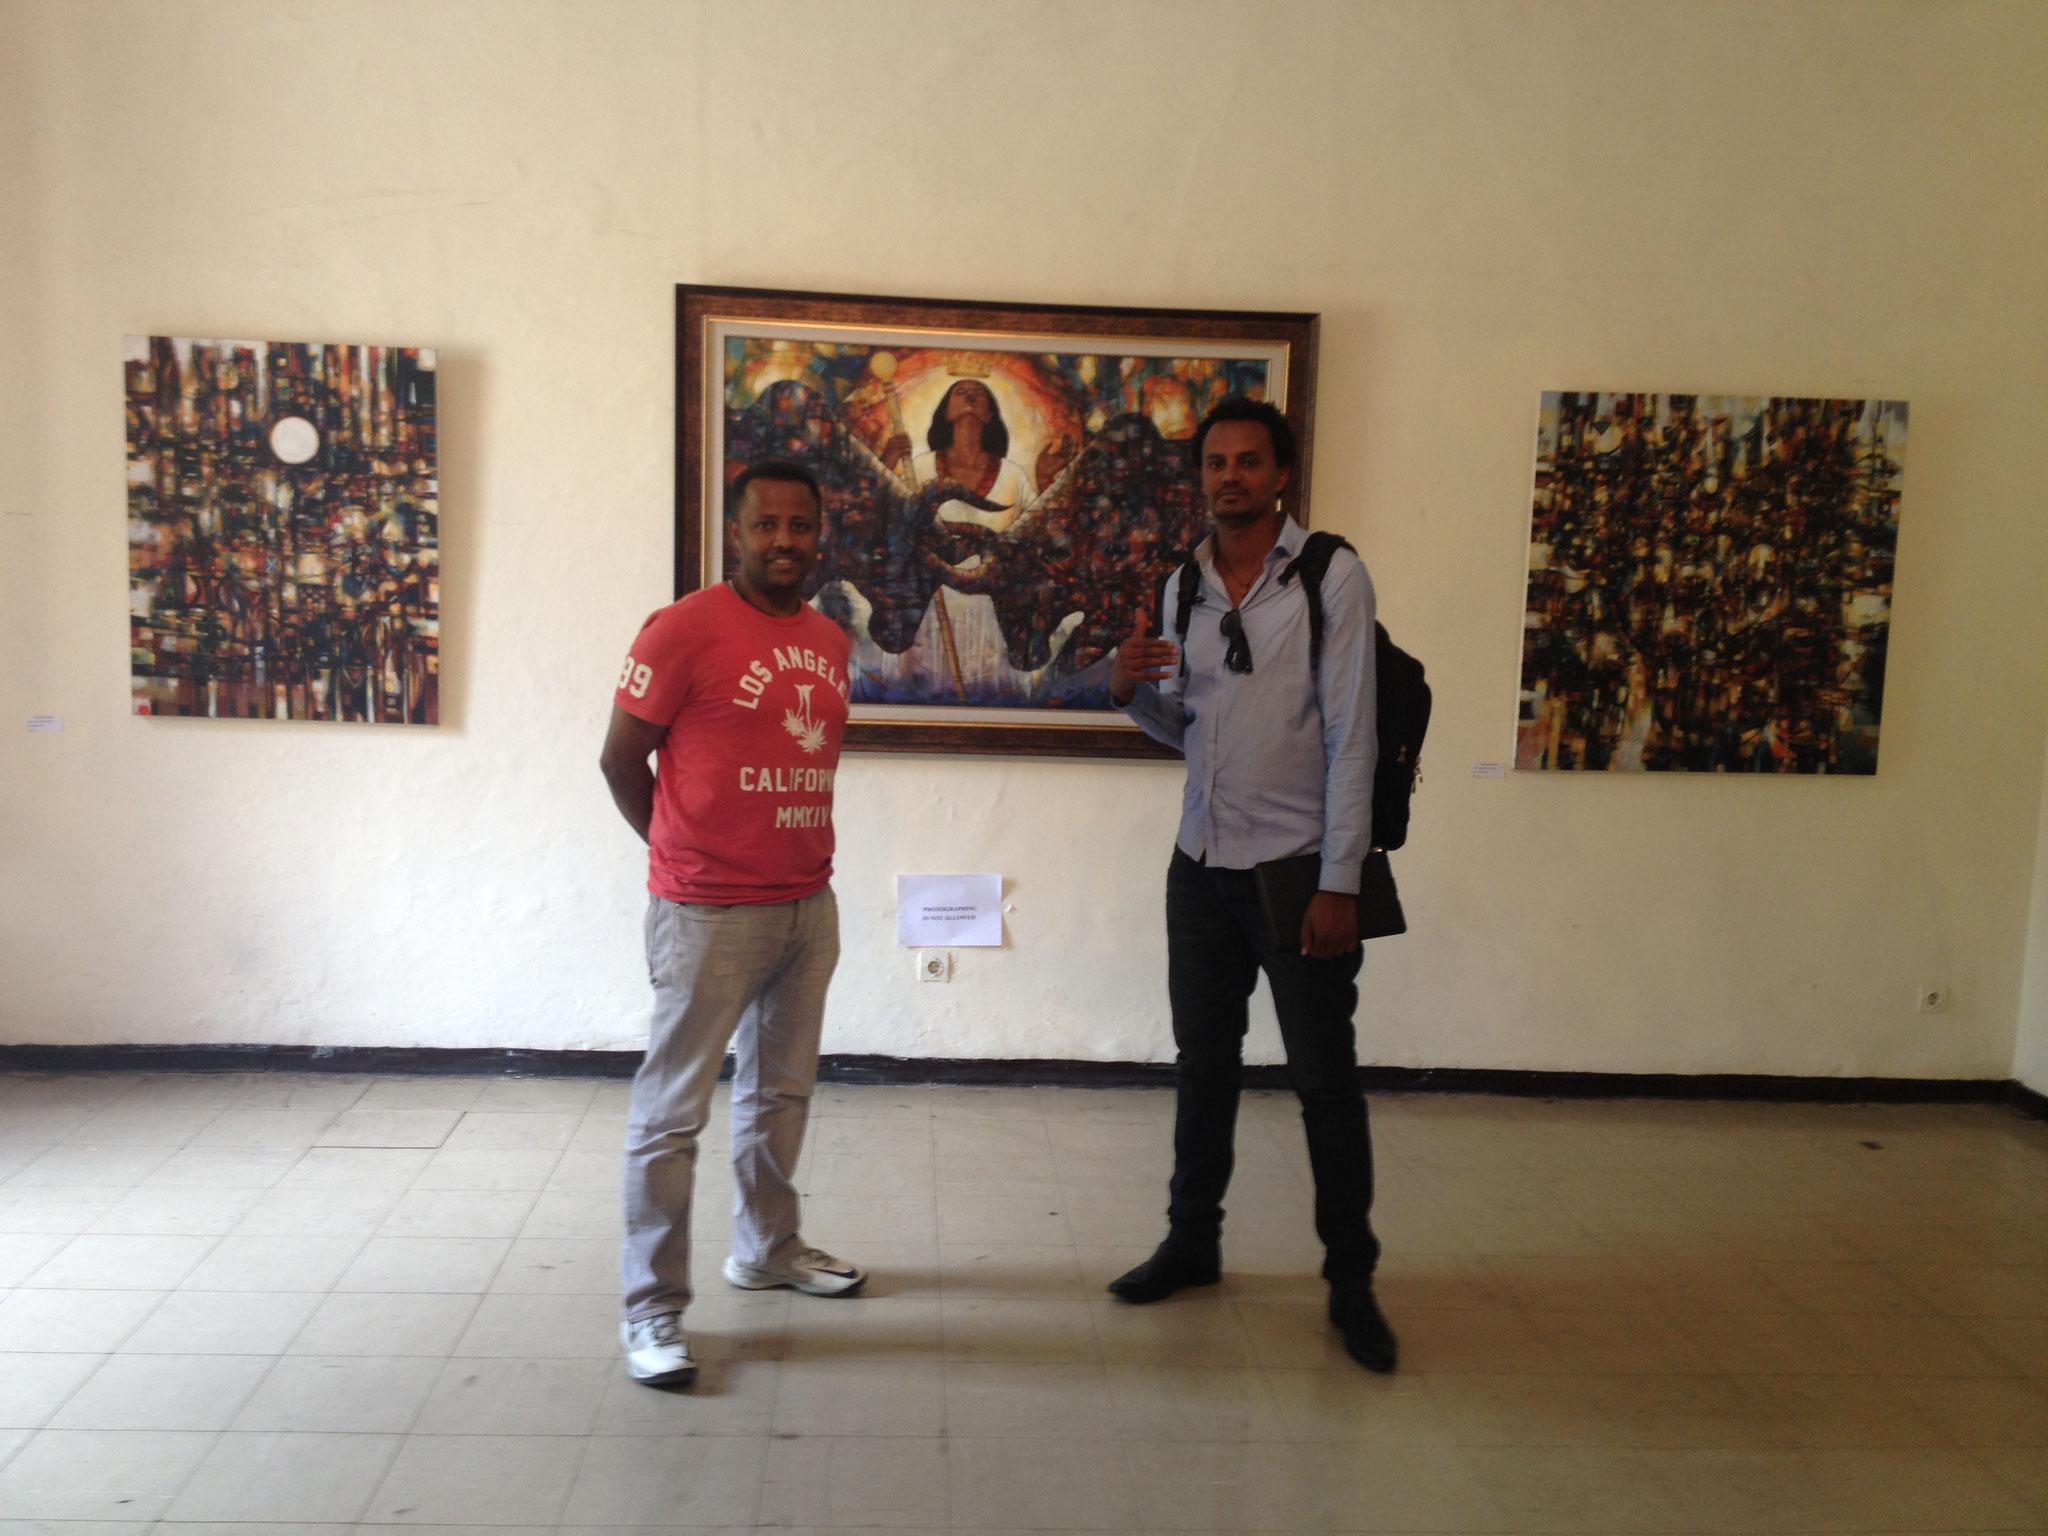 Robel Berhane Mawuli-Ethiopie Art Ethiopien Artistes Peintres  Association Plateforme Commerce  Artisanat Ethiopien Solidaire Equitable en Ethiopie Made in Ethiopia